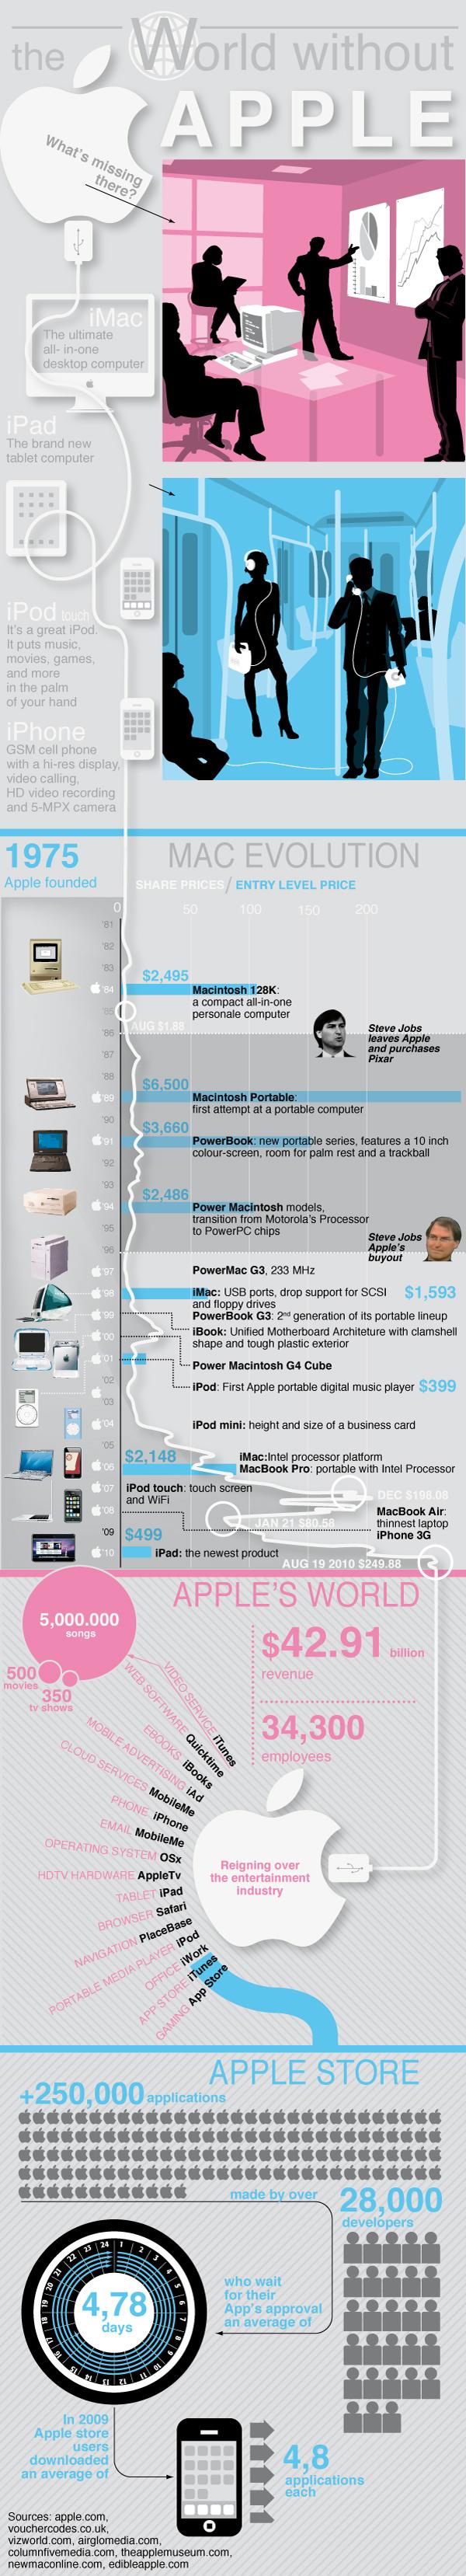 Pantalla de iMac Retina 5K contra Apple Macintosh original 3